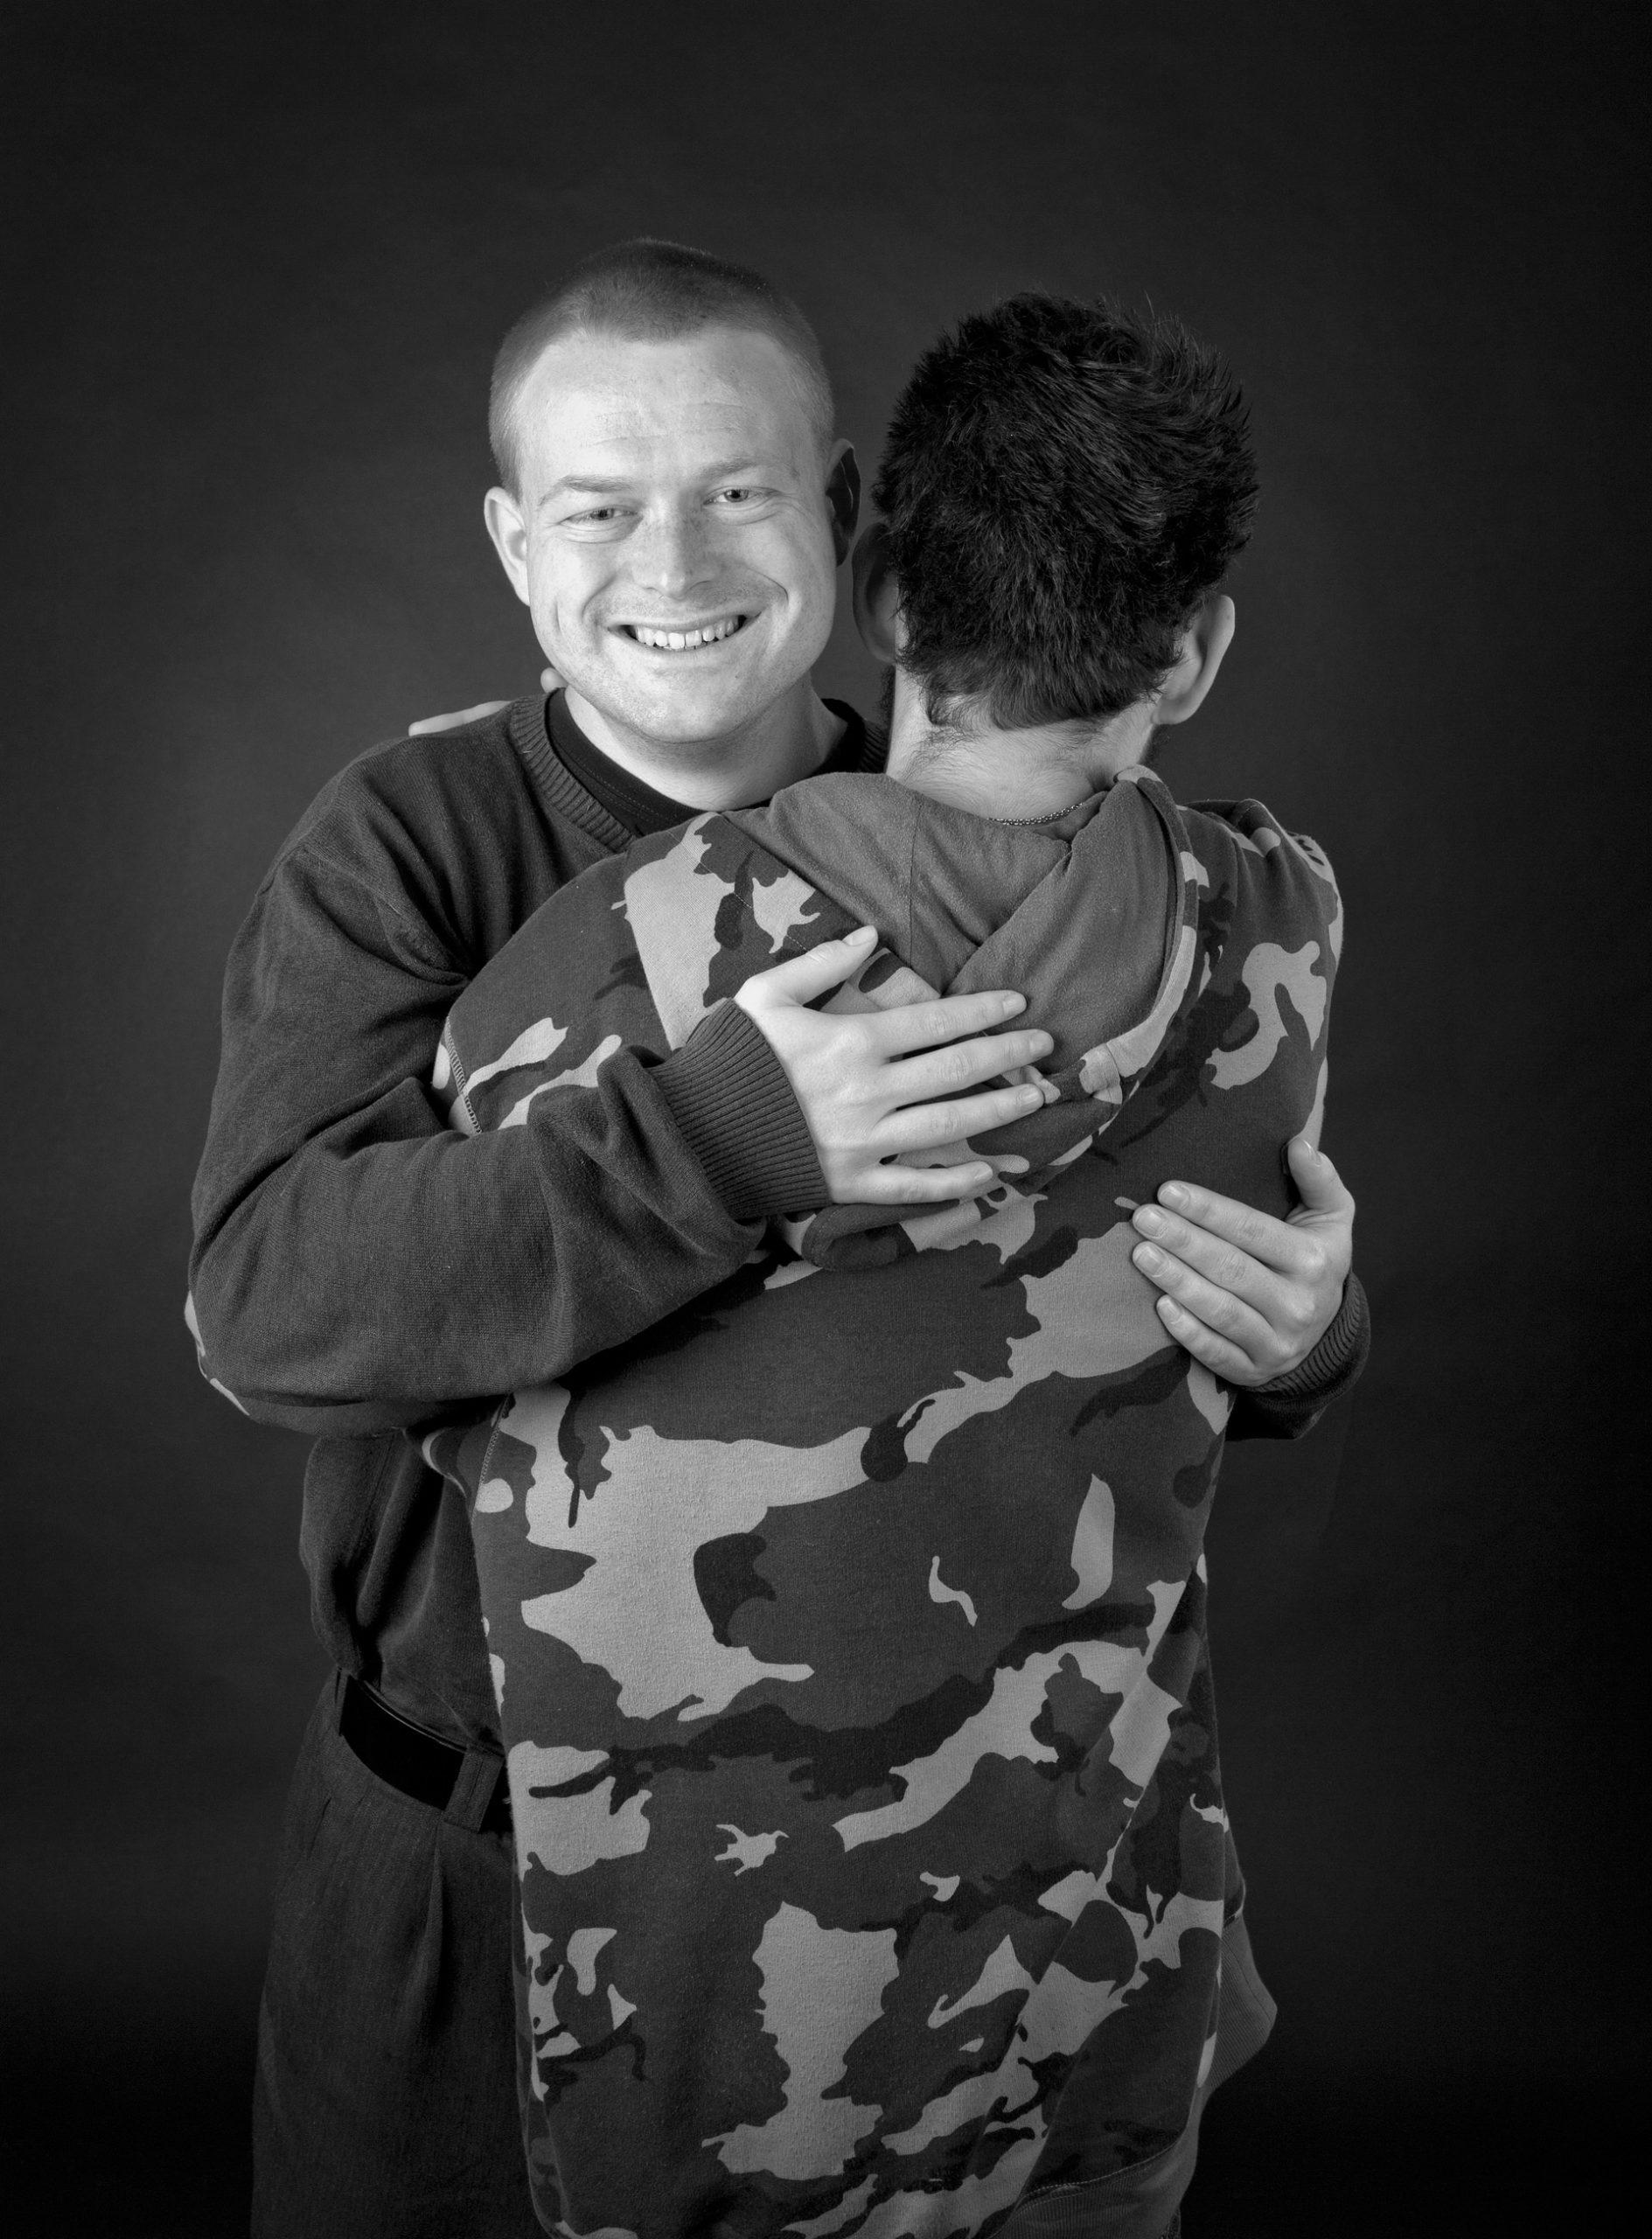 Two men hugging eachother